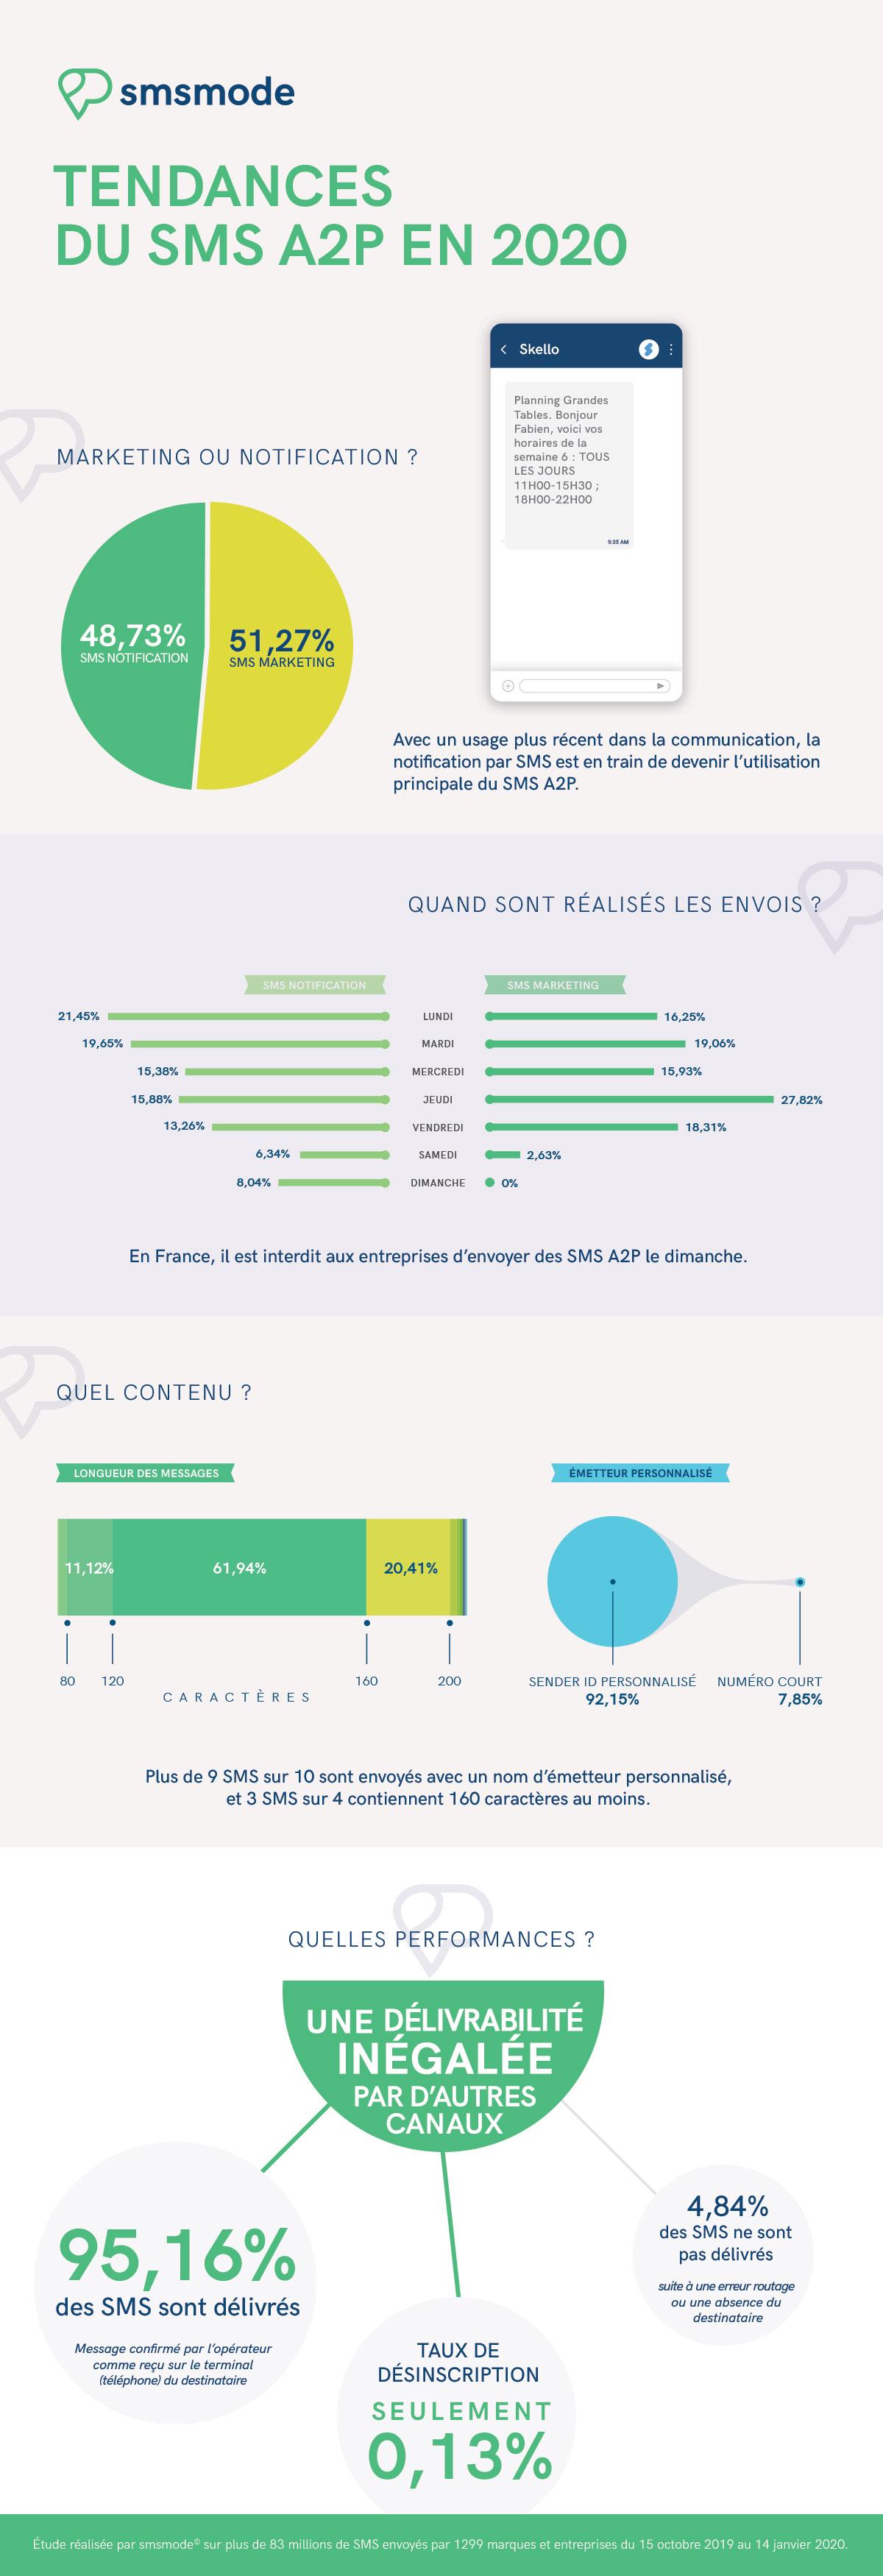 infographie-tendances-sms-A2P-smsmode